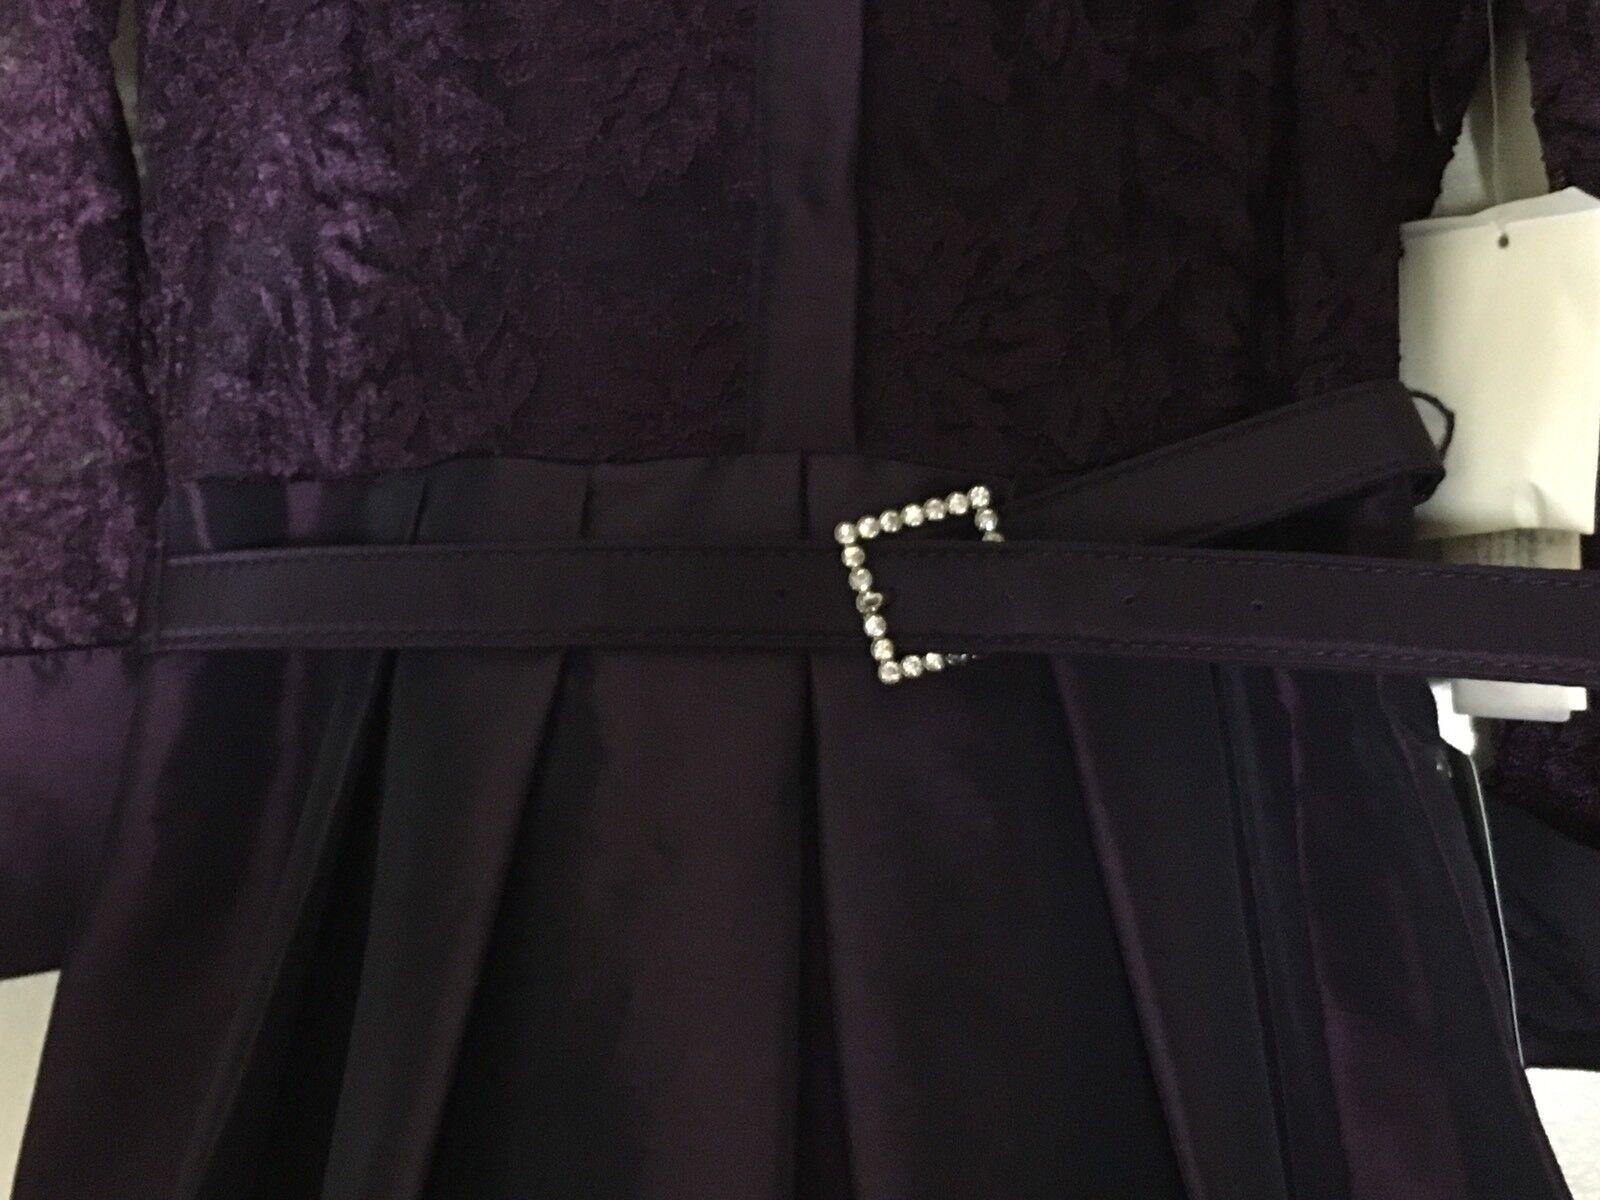 Eliza J Dress Party Gown Mixed Lace Lace Lace Taffeta Fit & Flare Plum Purple Sz 0 New e4303b